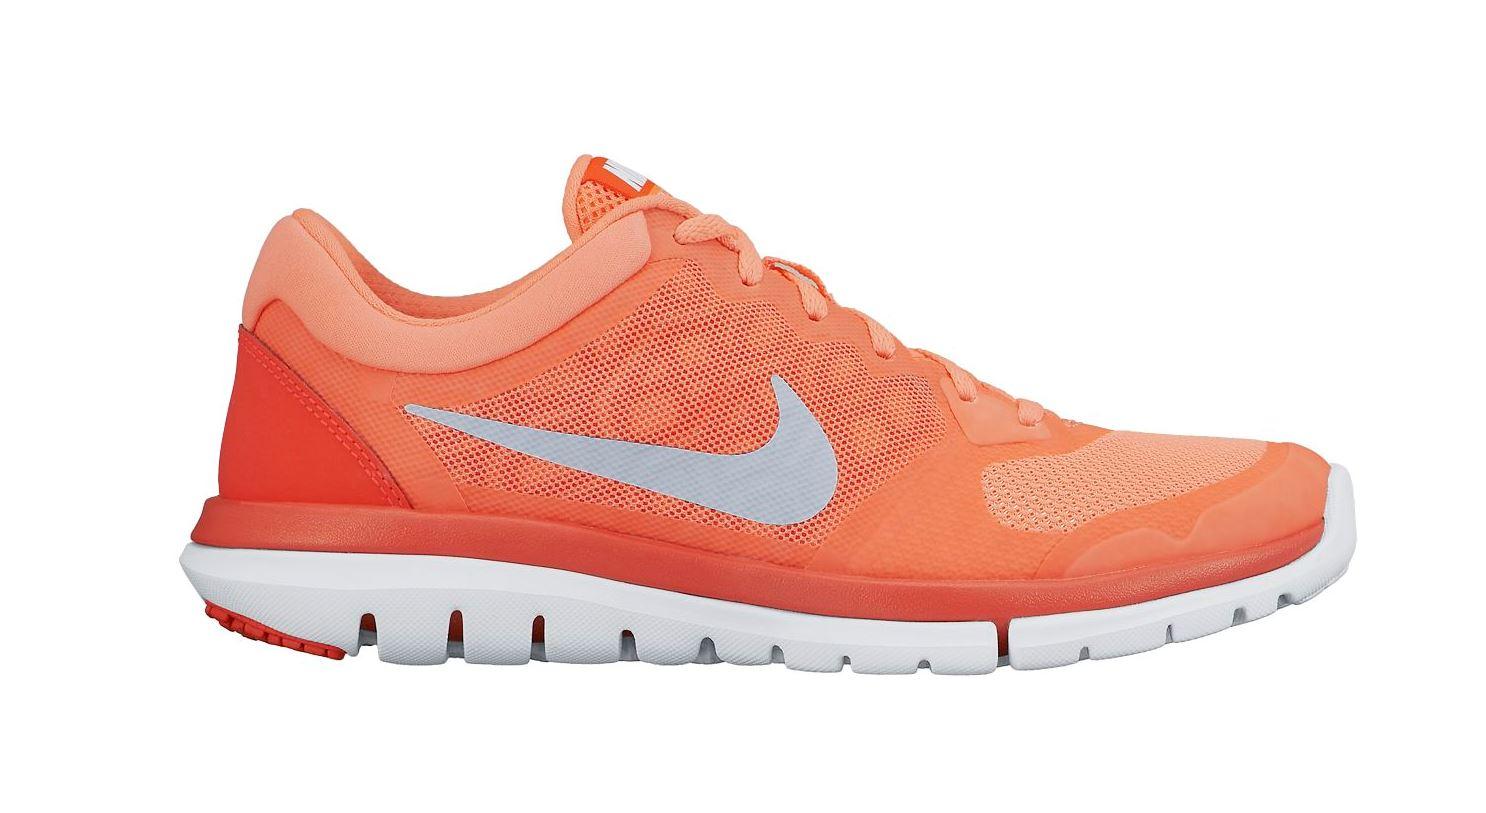 p-37931-Nike-Flex-2015-724987-601-pink.jpeg